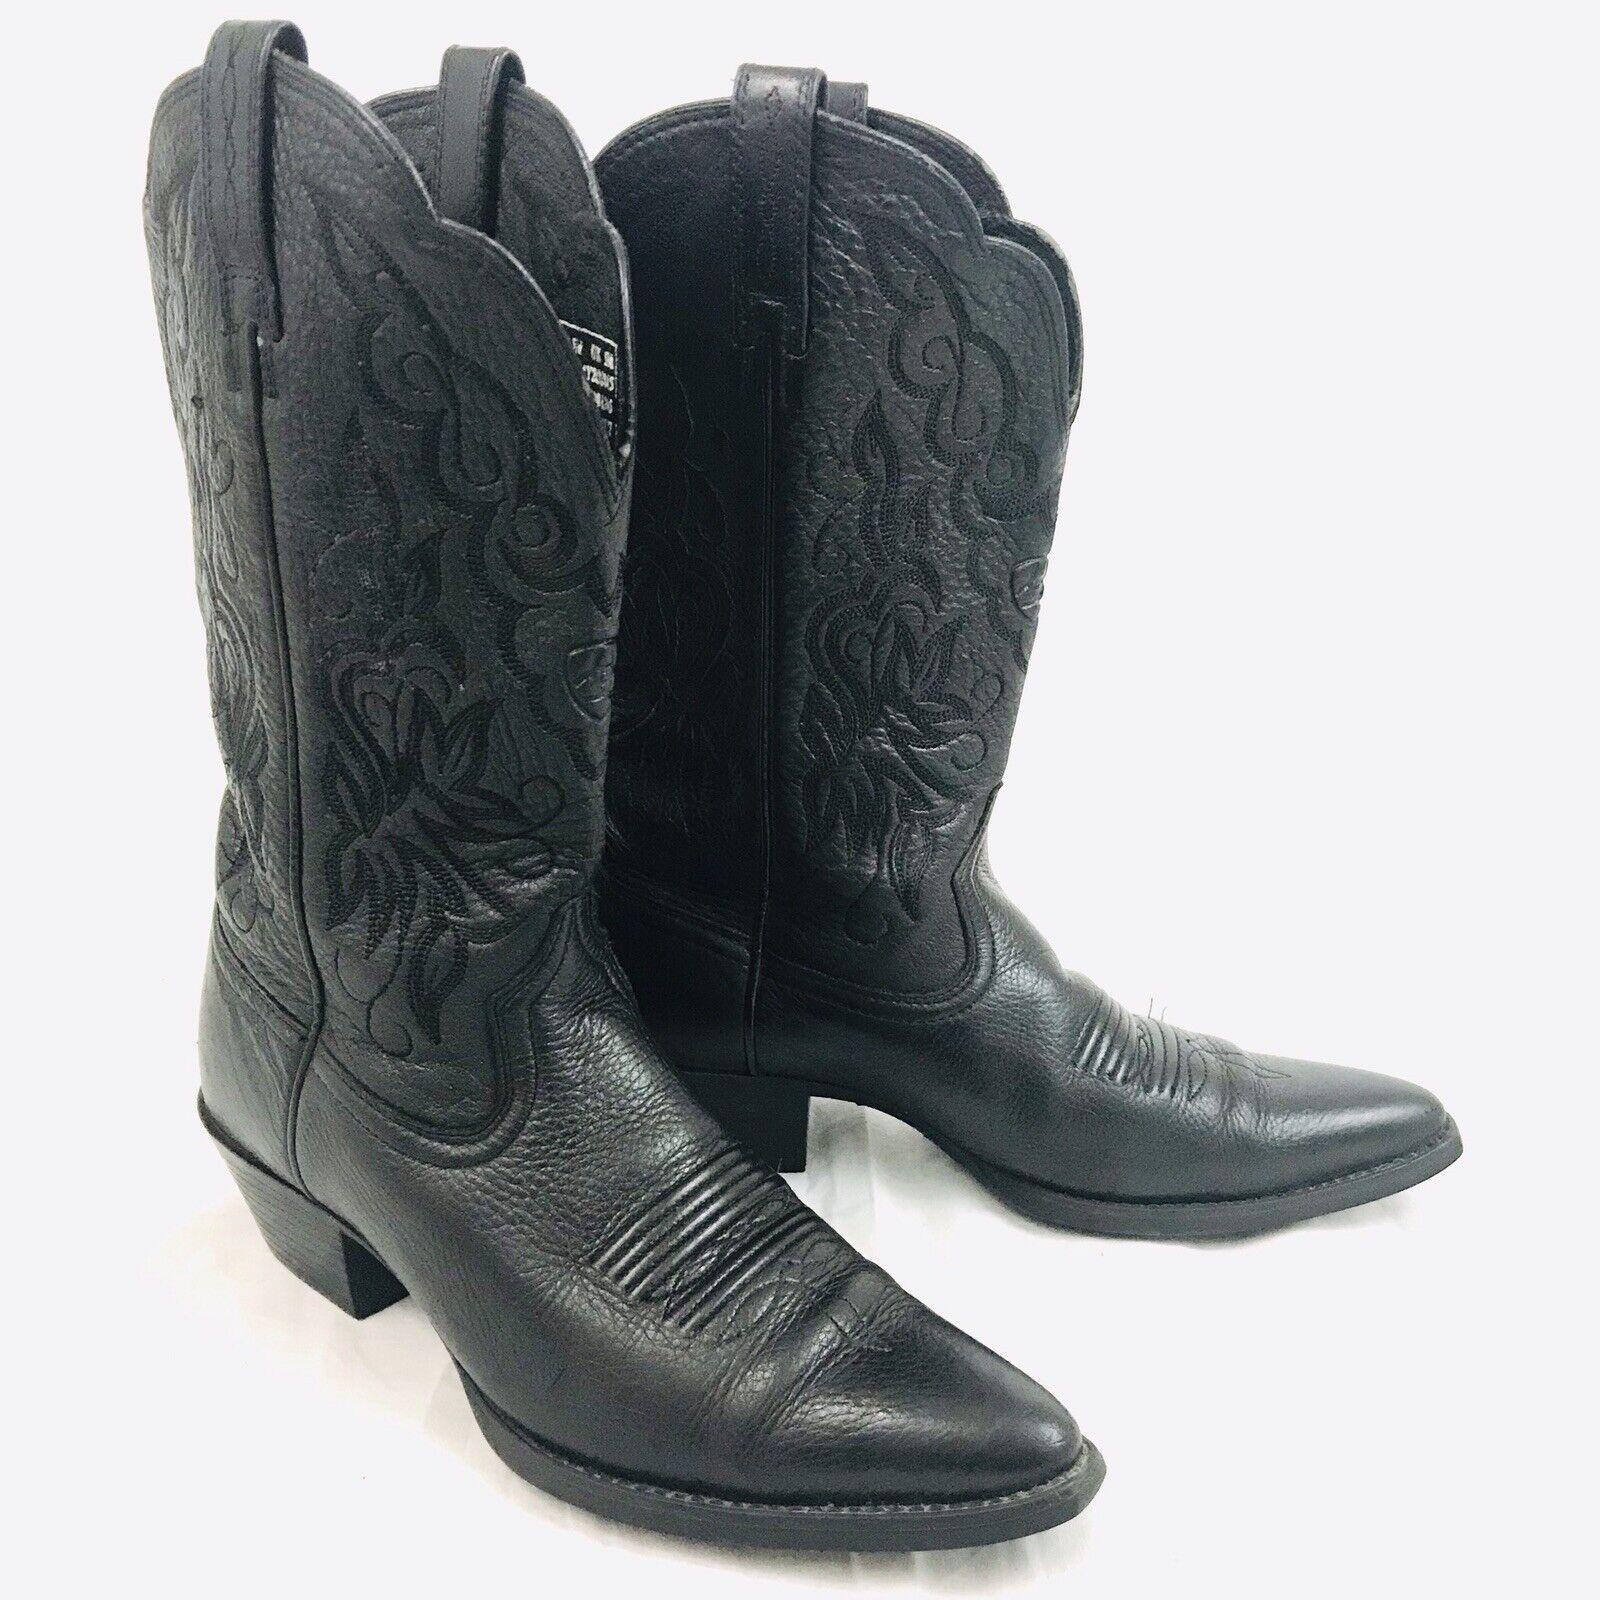 stile classico Ariat Heritage Heritage Heritage donna 15771 nero Leather Western stivali 7.5 B  marchio famoso